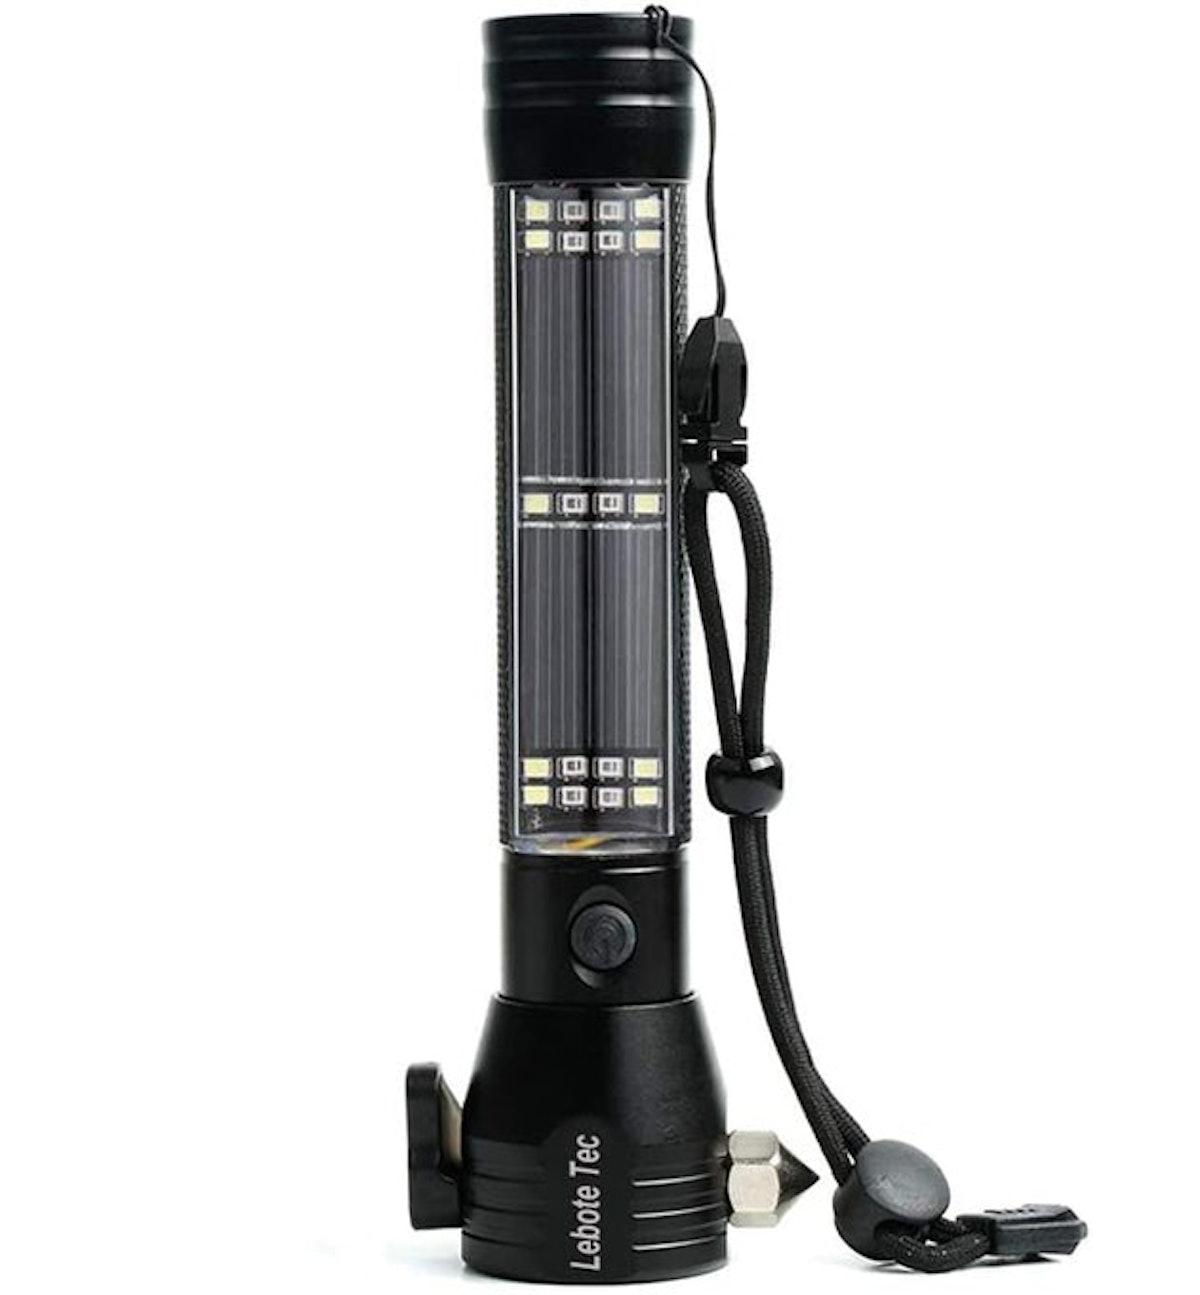 Lebote Tec Solar Power Tactical Flashlight